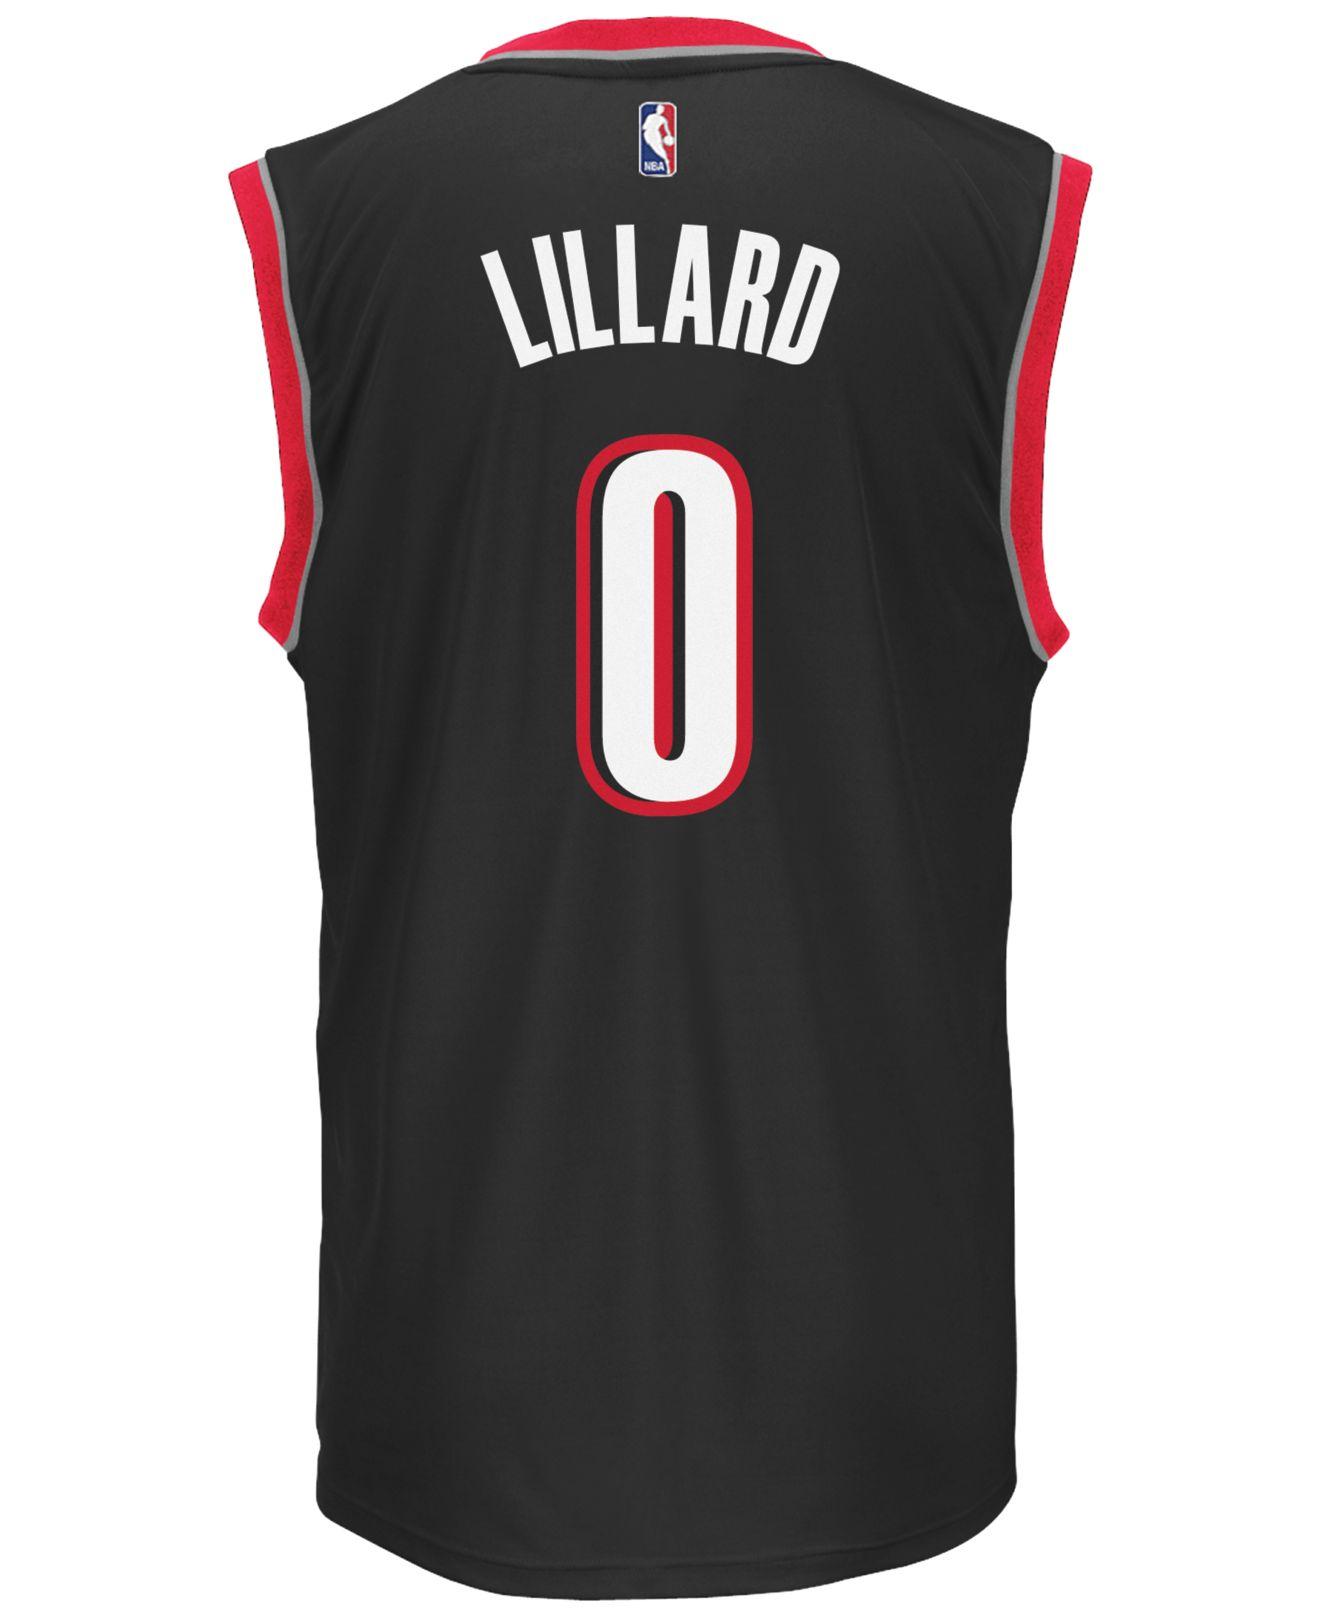 Adidas Mens Damian Lillard Portland Trail Blazers